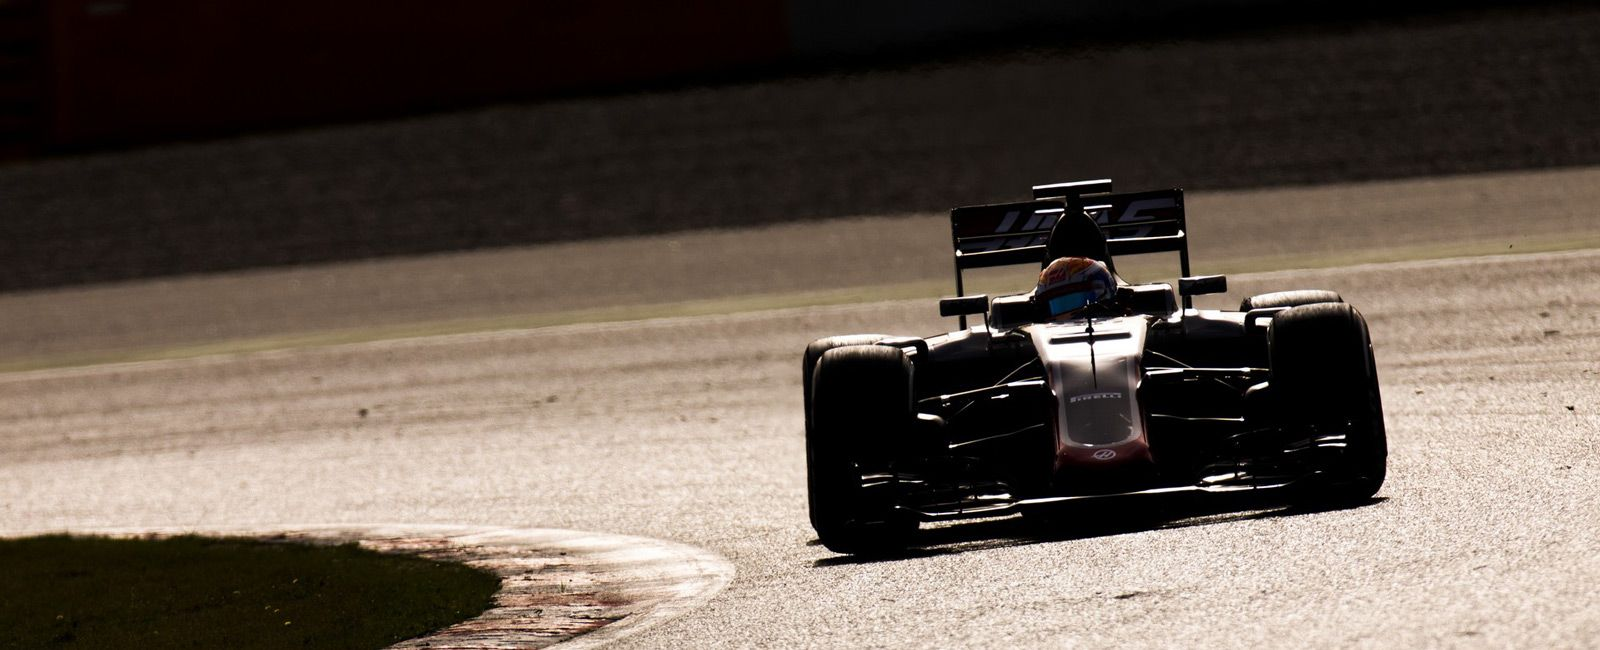 F1-Update-Gear-Patrol-Ambiance-3